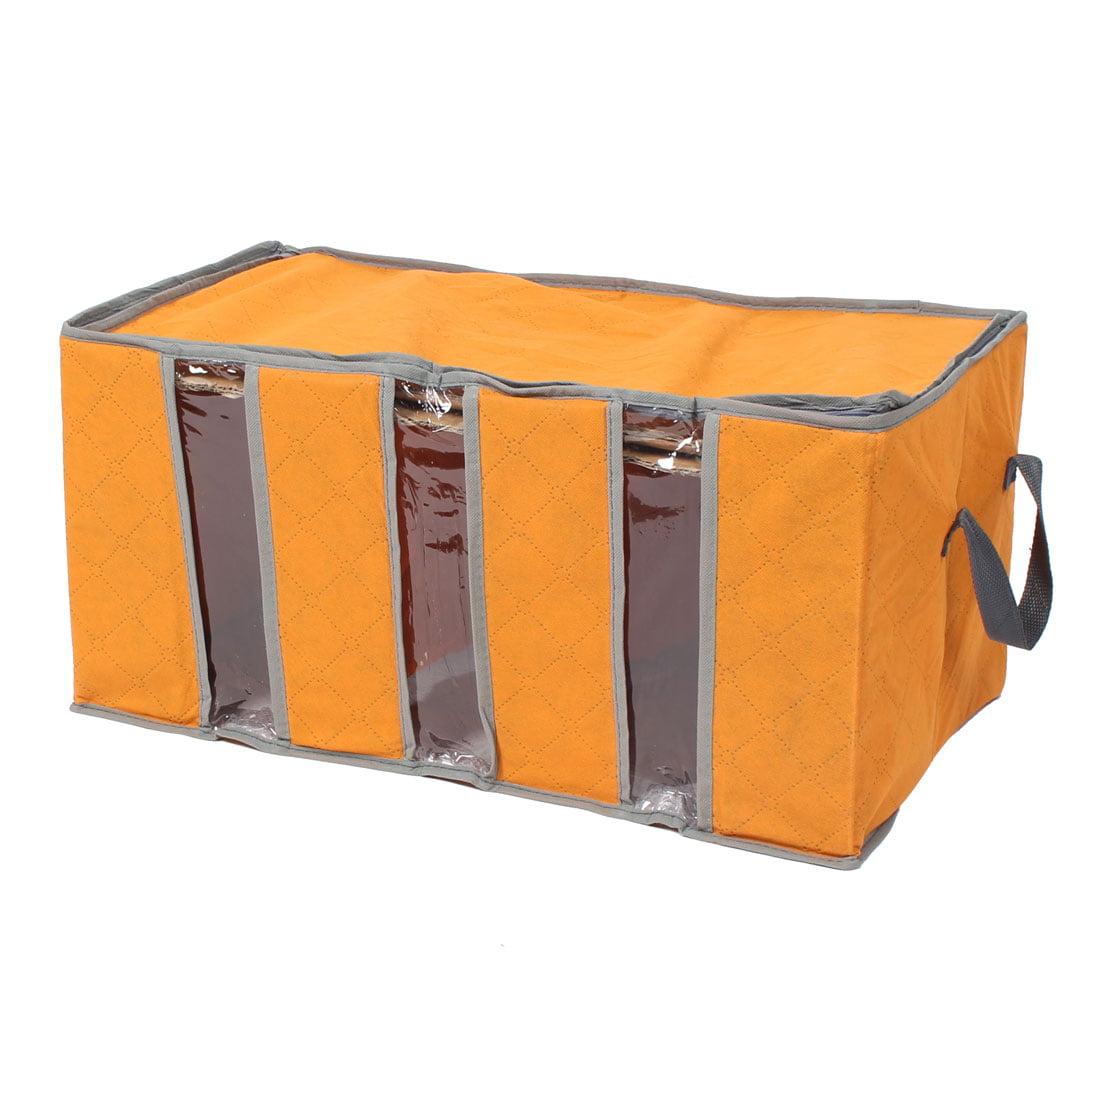 Clothes Blanket Closet Sweater Foldable Storage Box Case Bag Orange 58x29x33cm